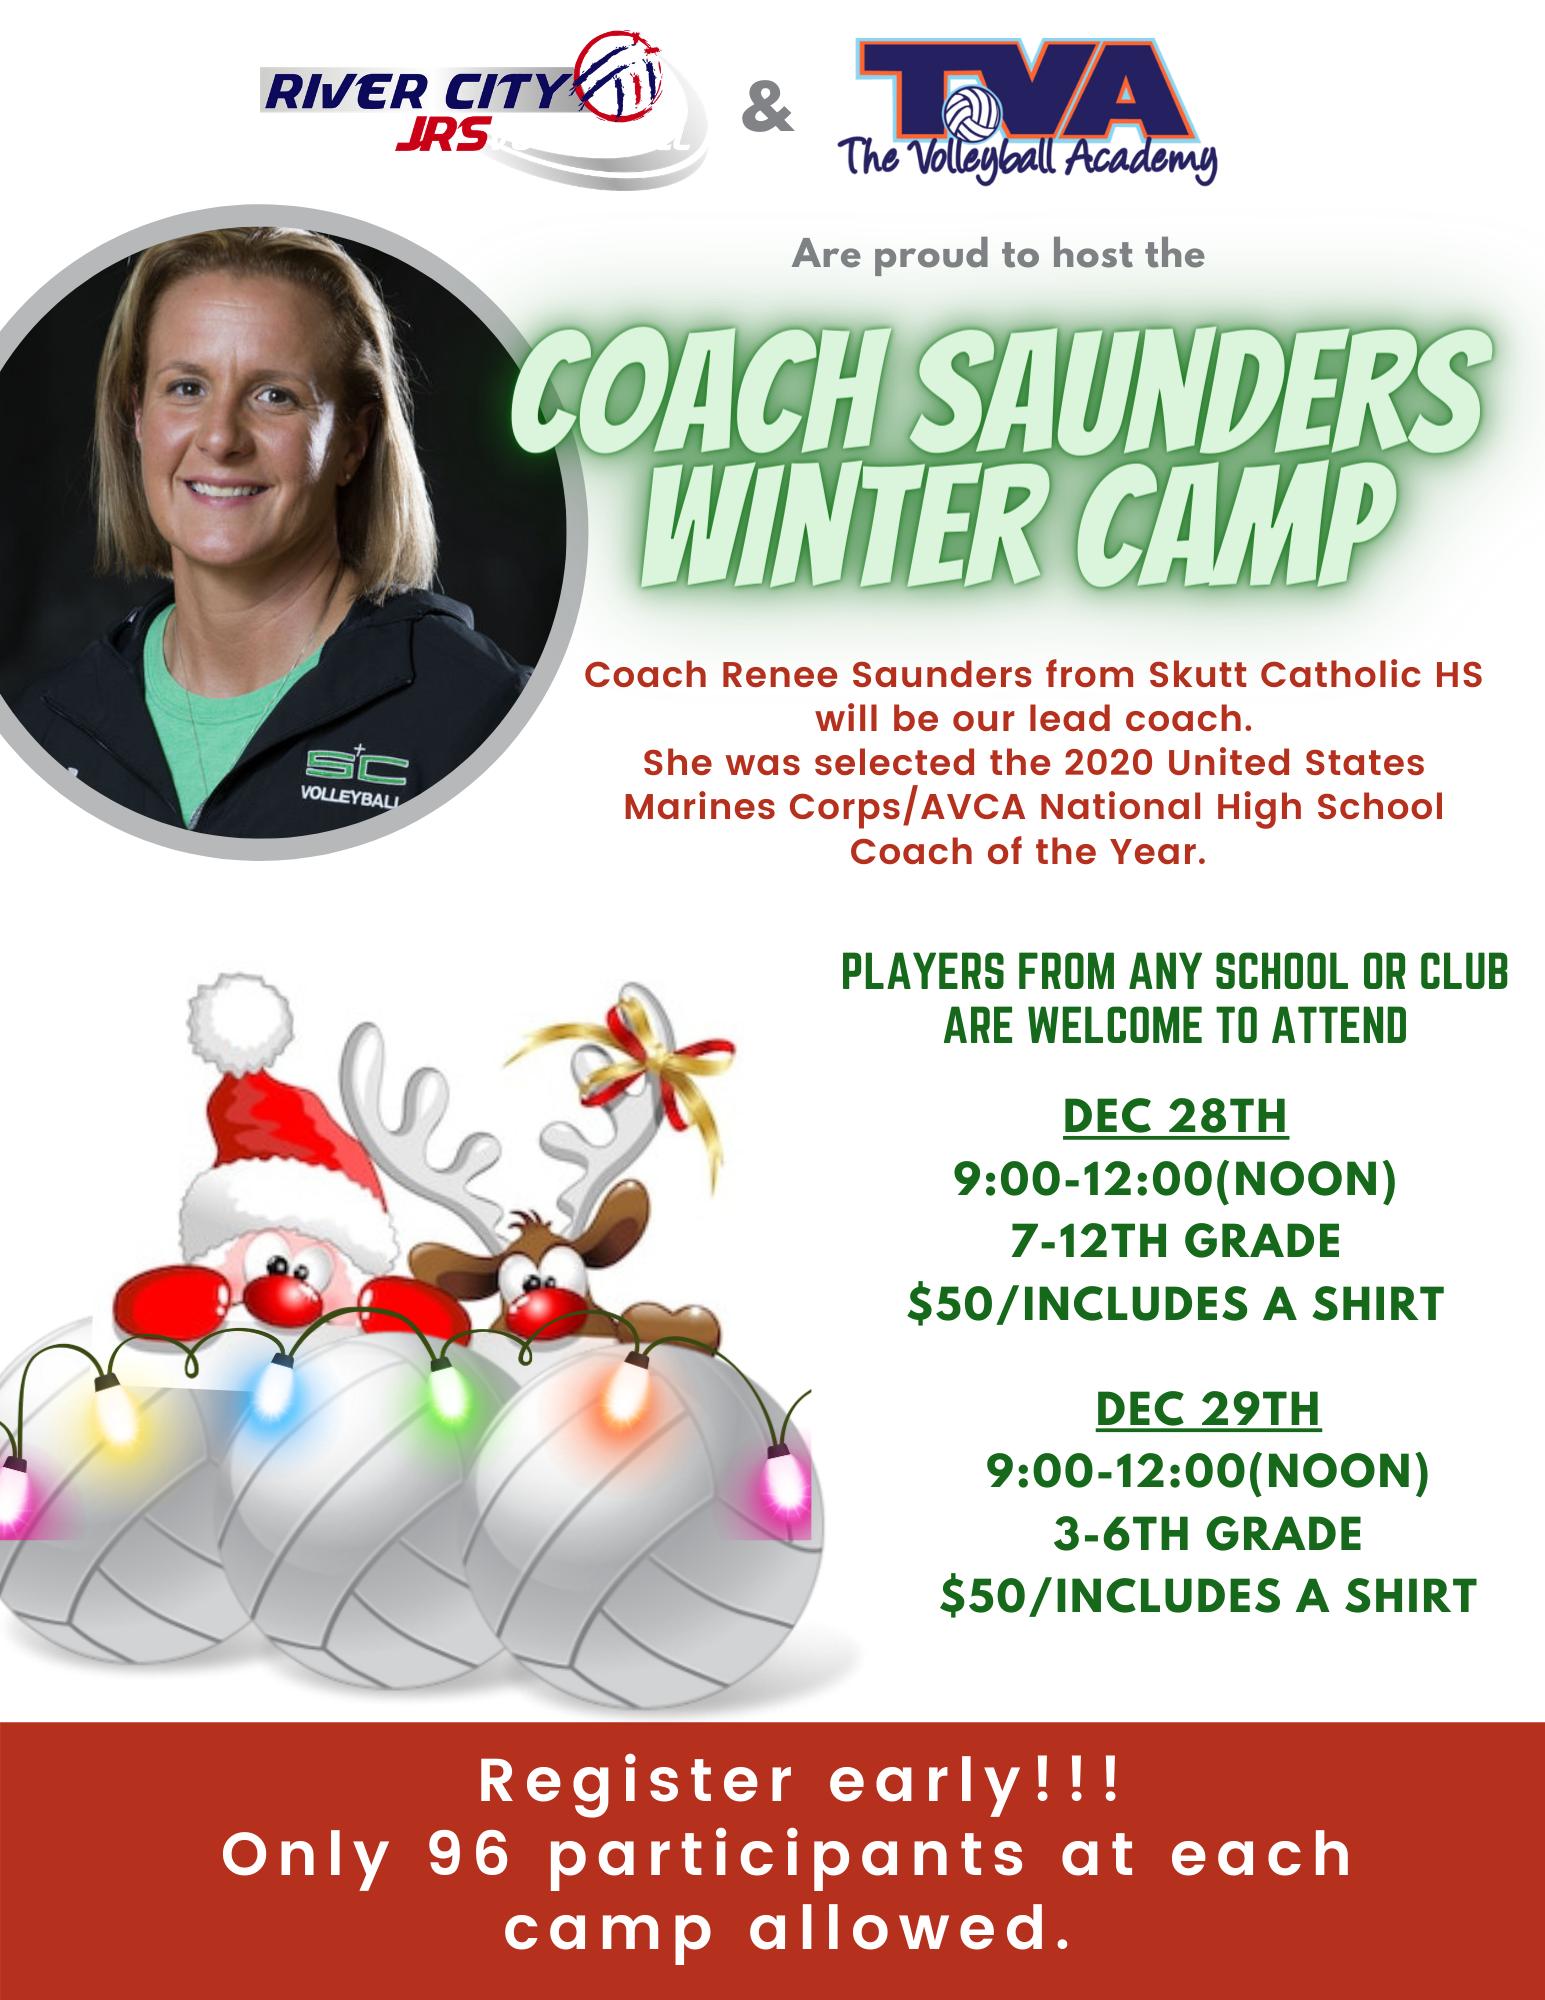 Coach Saunders Winter Camp Flyer-7